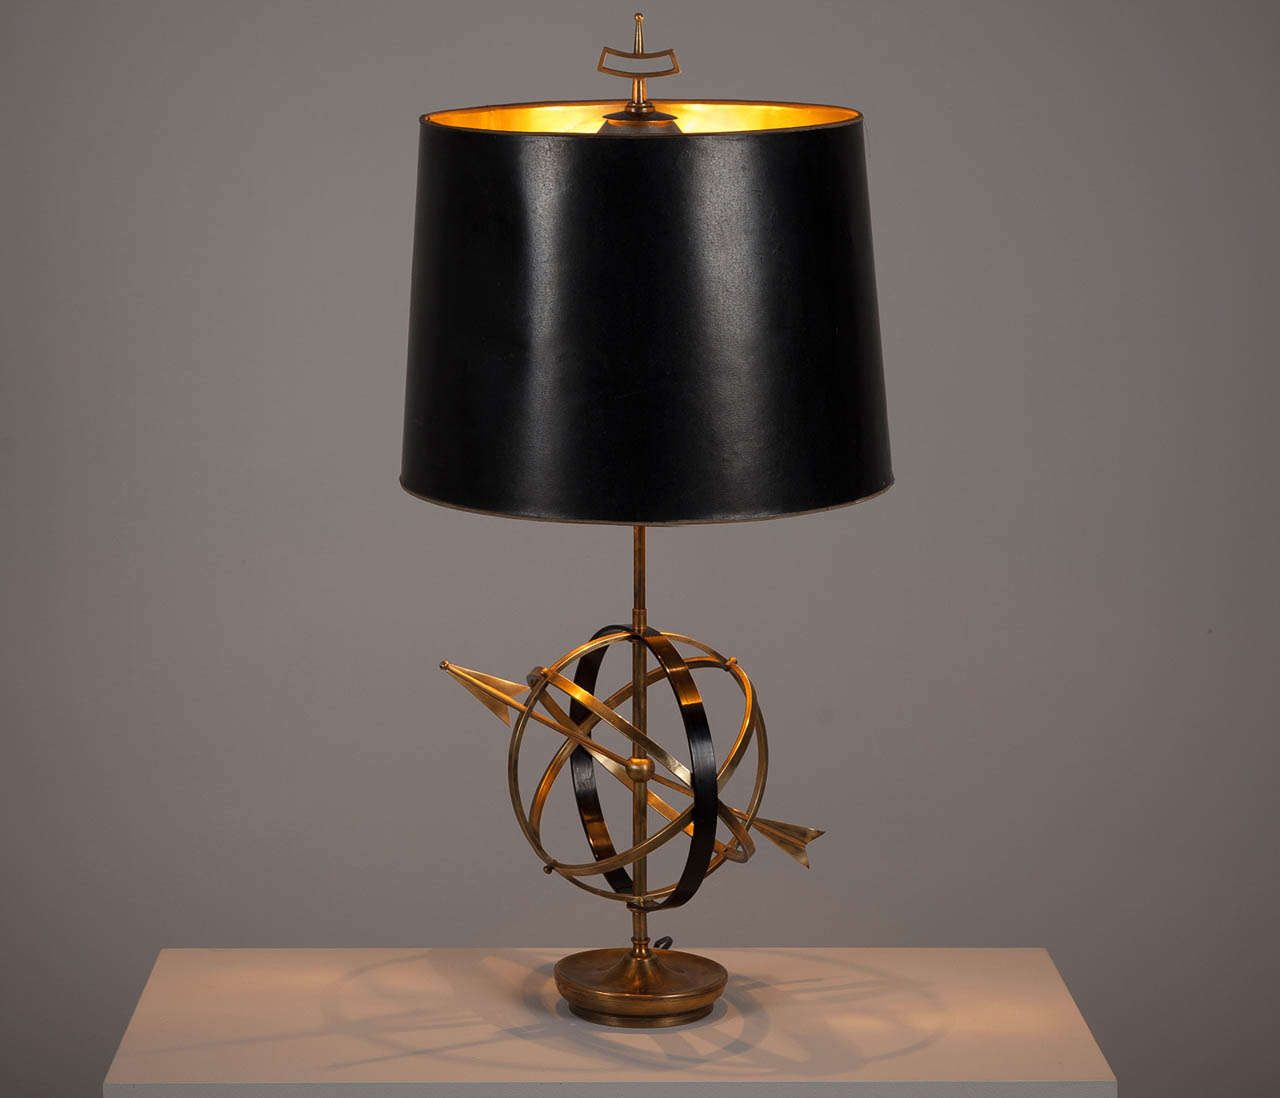 solid brass 39 sundial 39 table lamp at 1stdibs. Black Bedroom Furniture Sets. Home Design Ideas